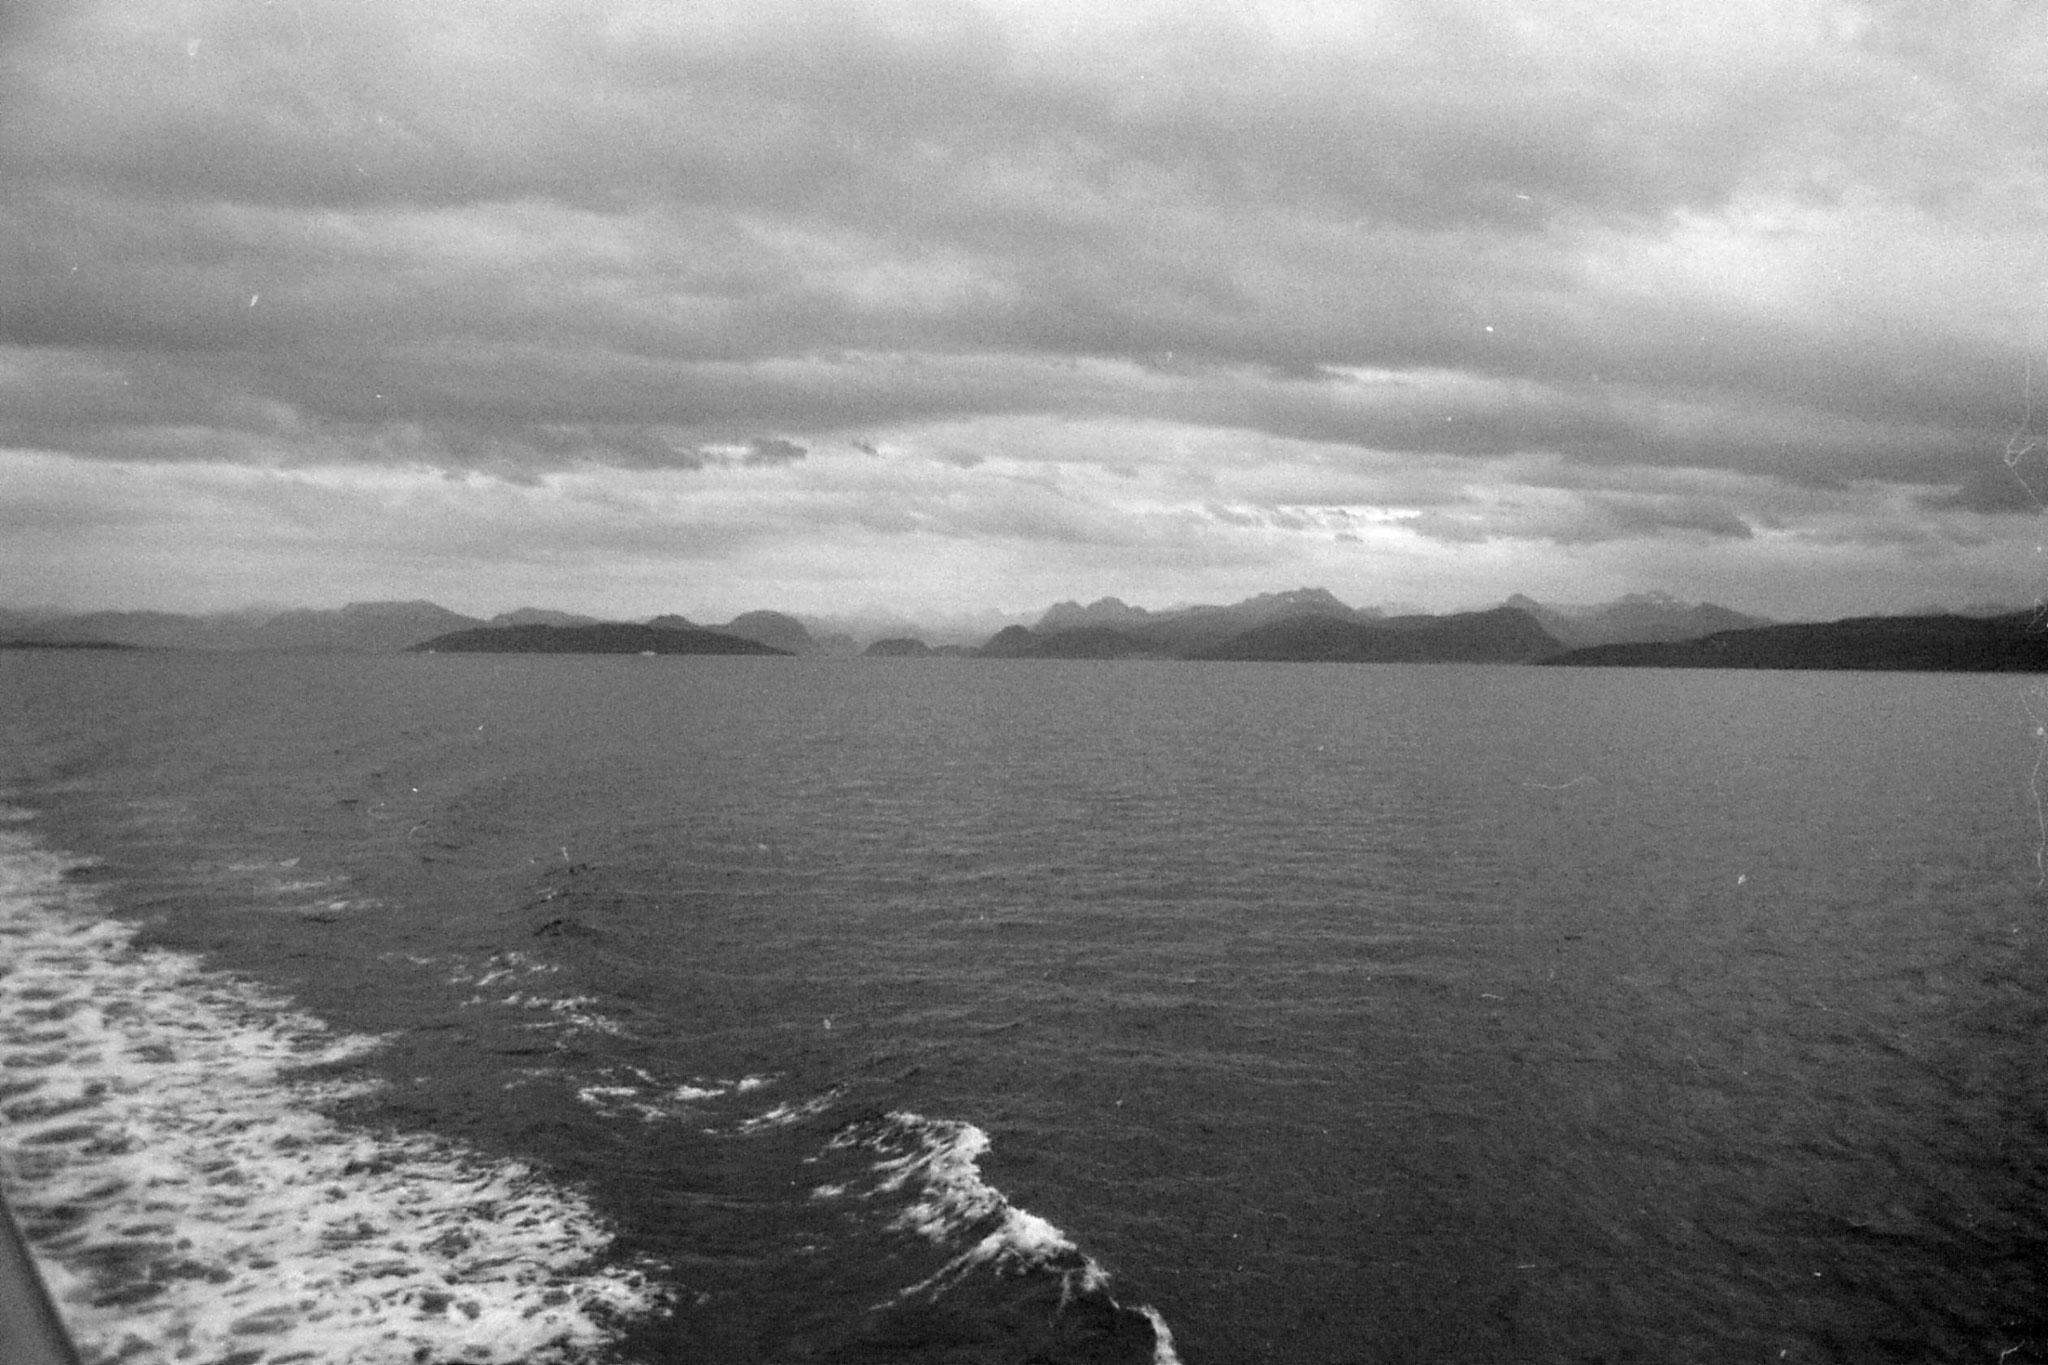 22/9/1988: 3: leaving Molde, Romsdal mountains